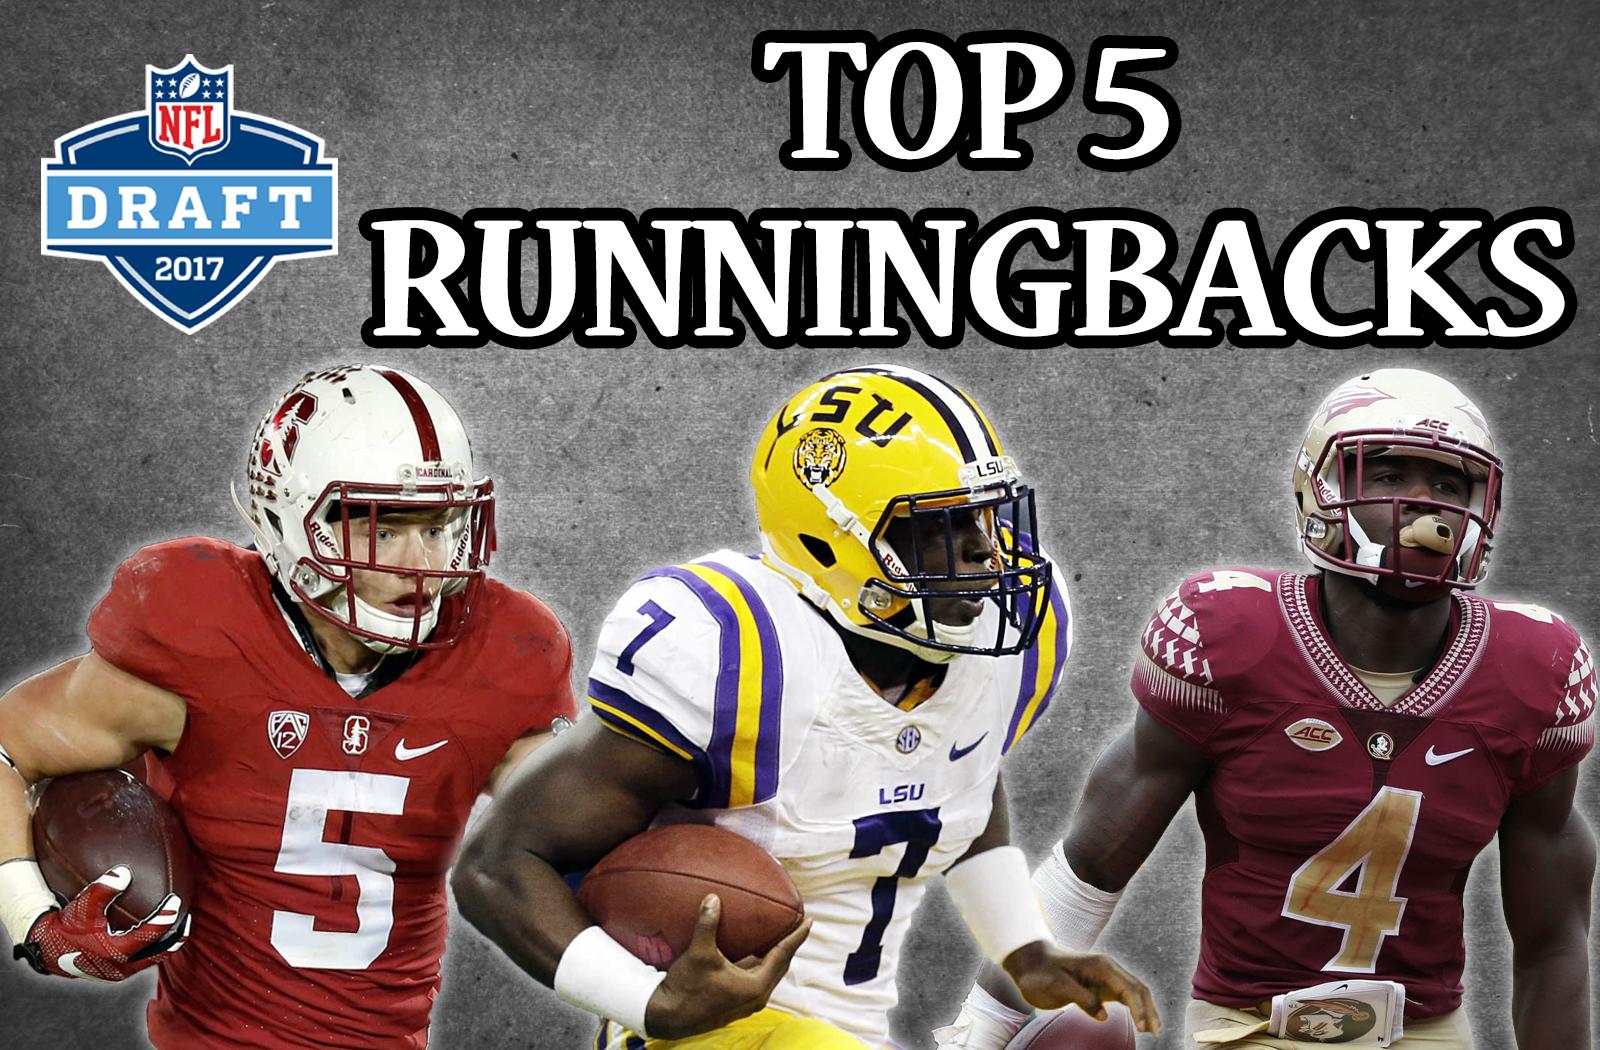 NFL en estado puro: 2017 NFL Draft | Top 5 Runningbacks | MARCO ÁLVAREZ